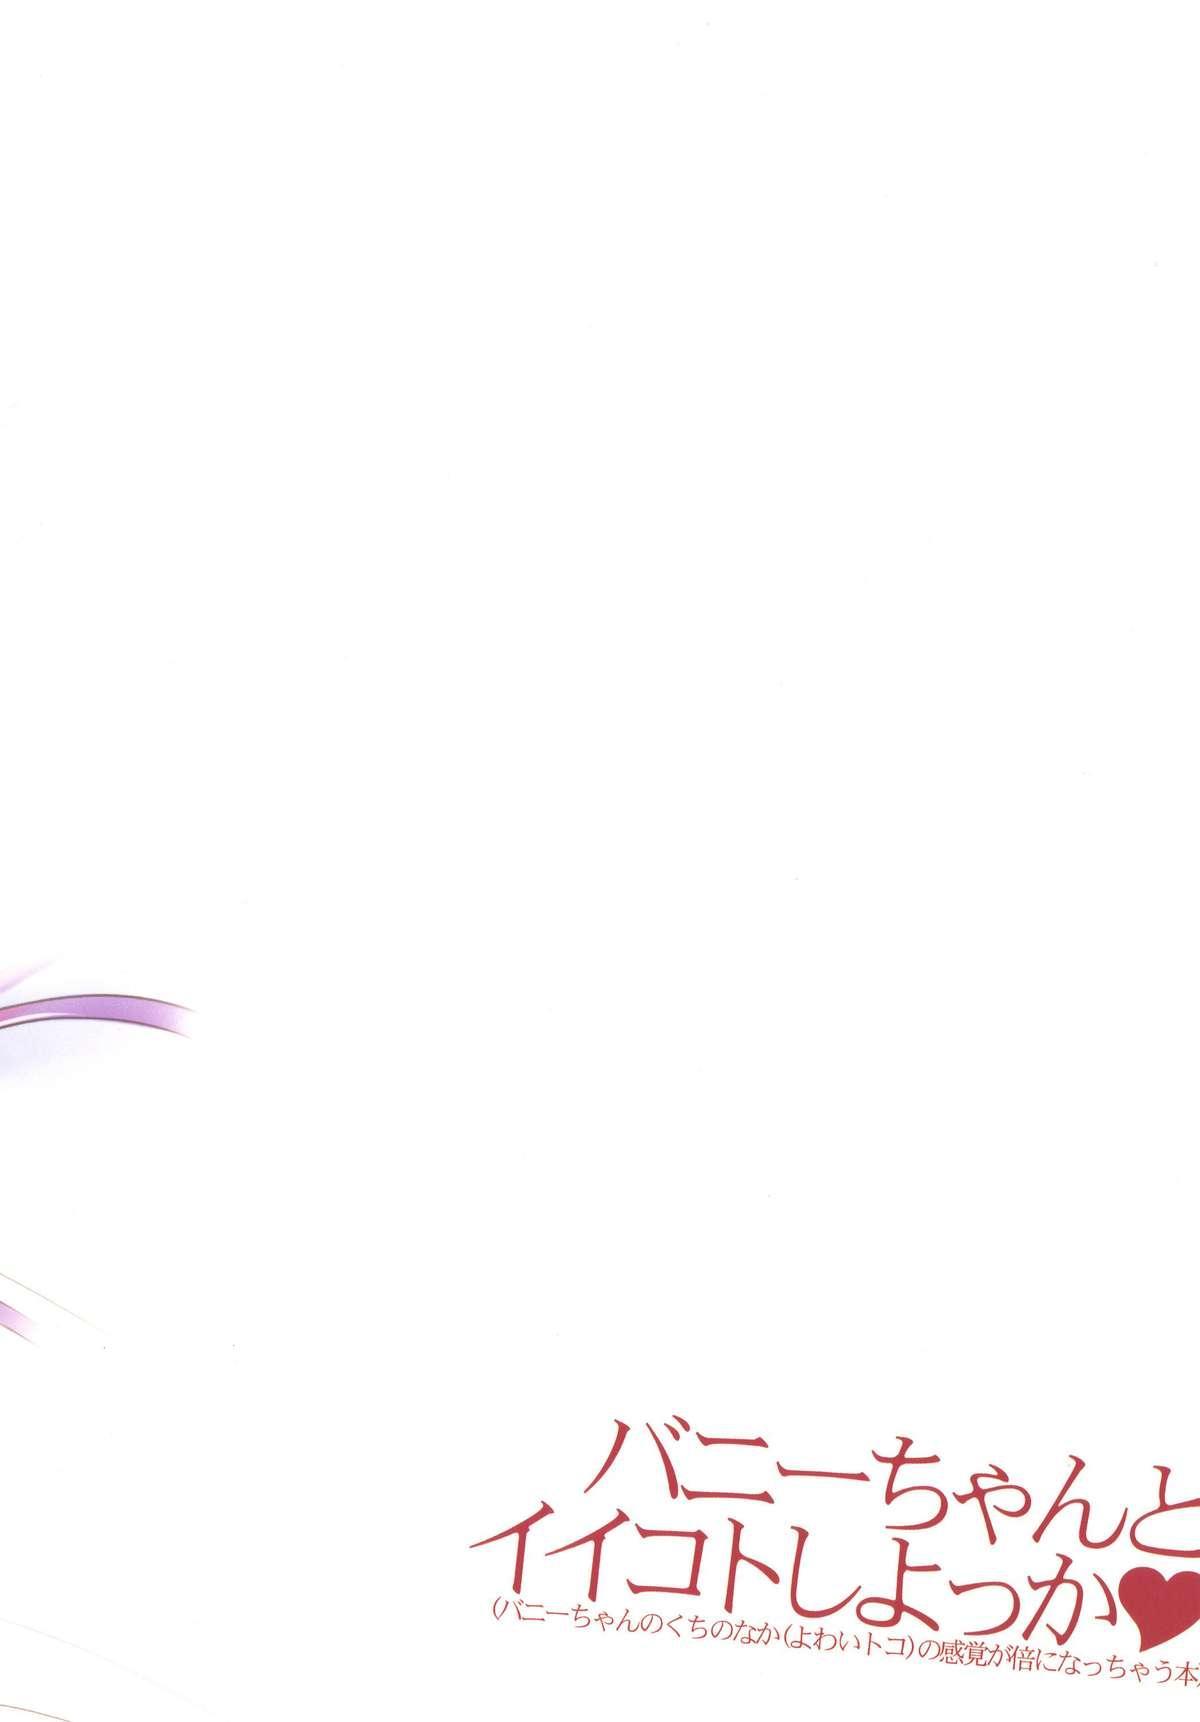 Bunny-chan to Iikoto Shiyokka 39